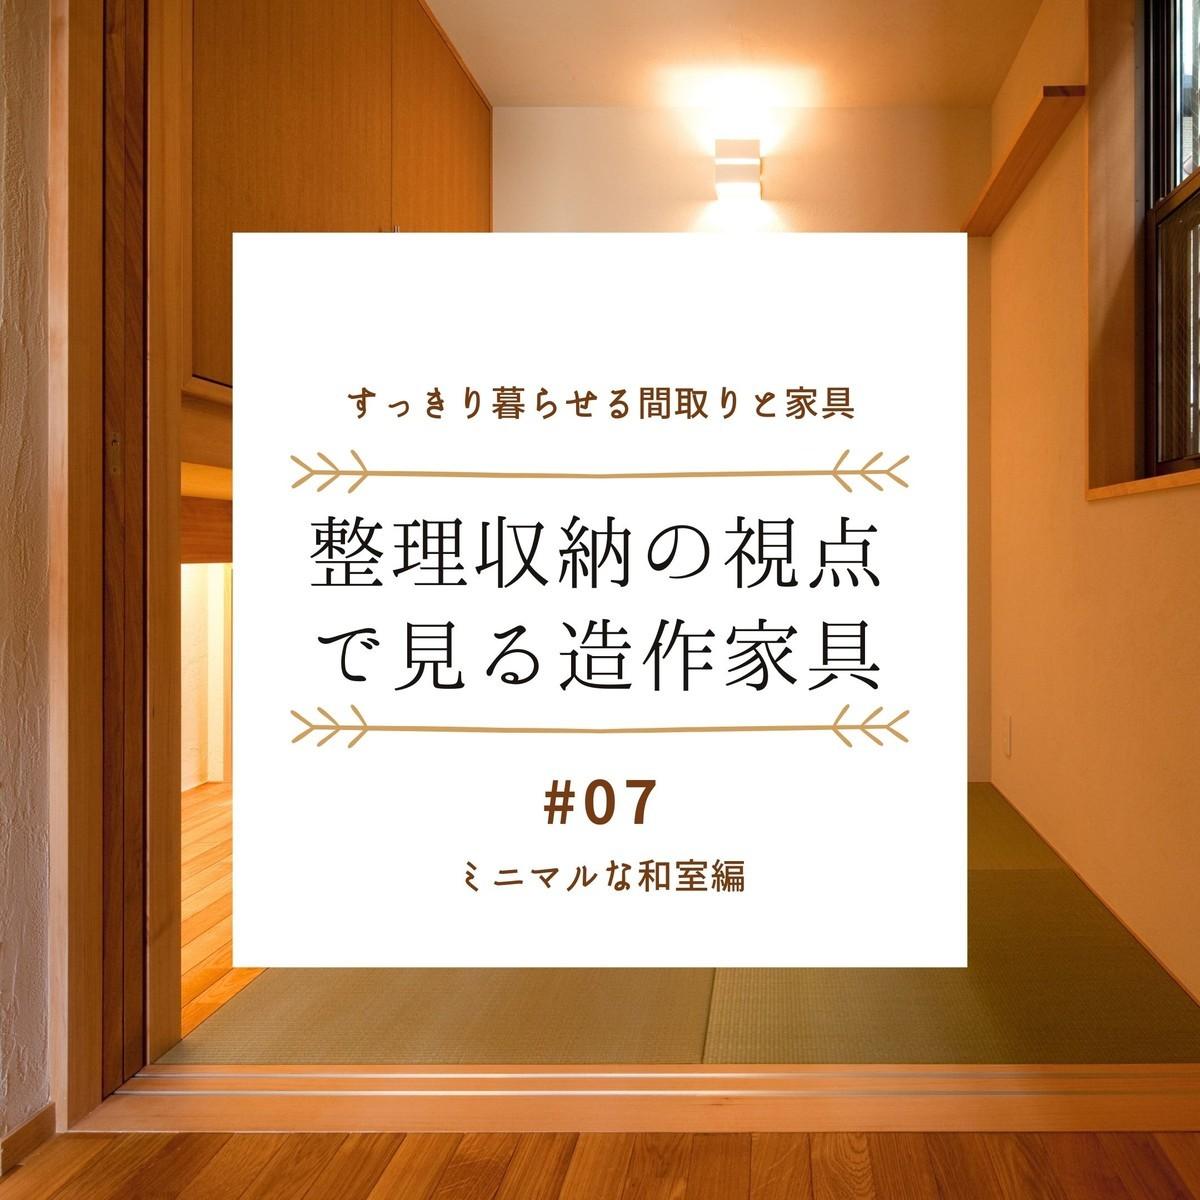 f:id:yusei2000:20201030171025j:plain